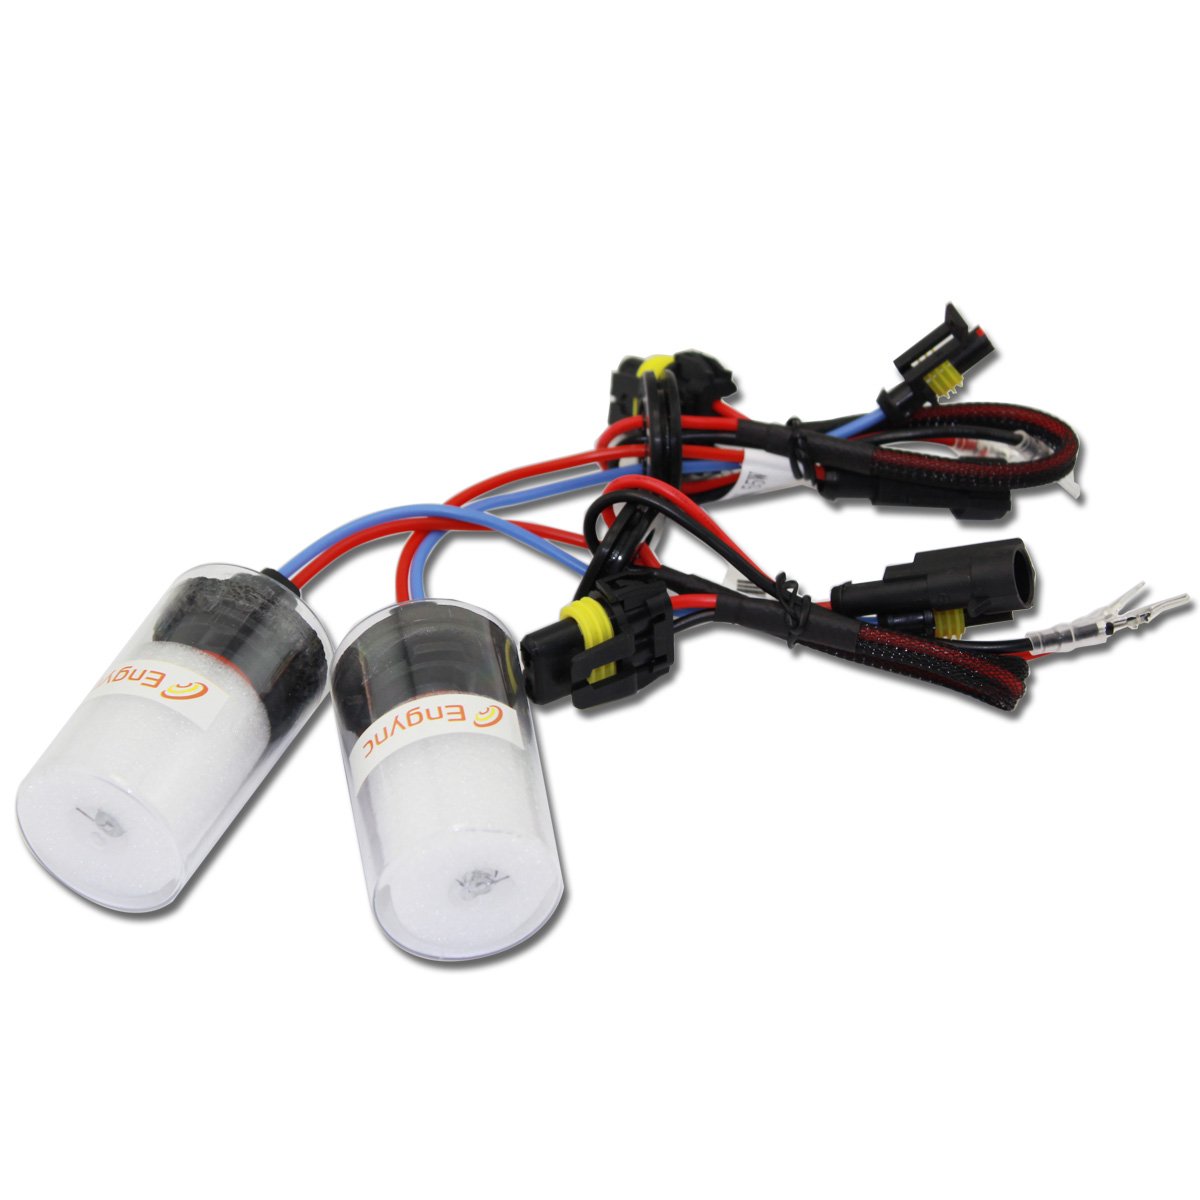 Hid Relay Wiring Harness Kit H1 H3 H7 H9 H10 H11 Hb3 Hb4 9005 9006